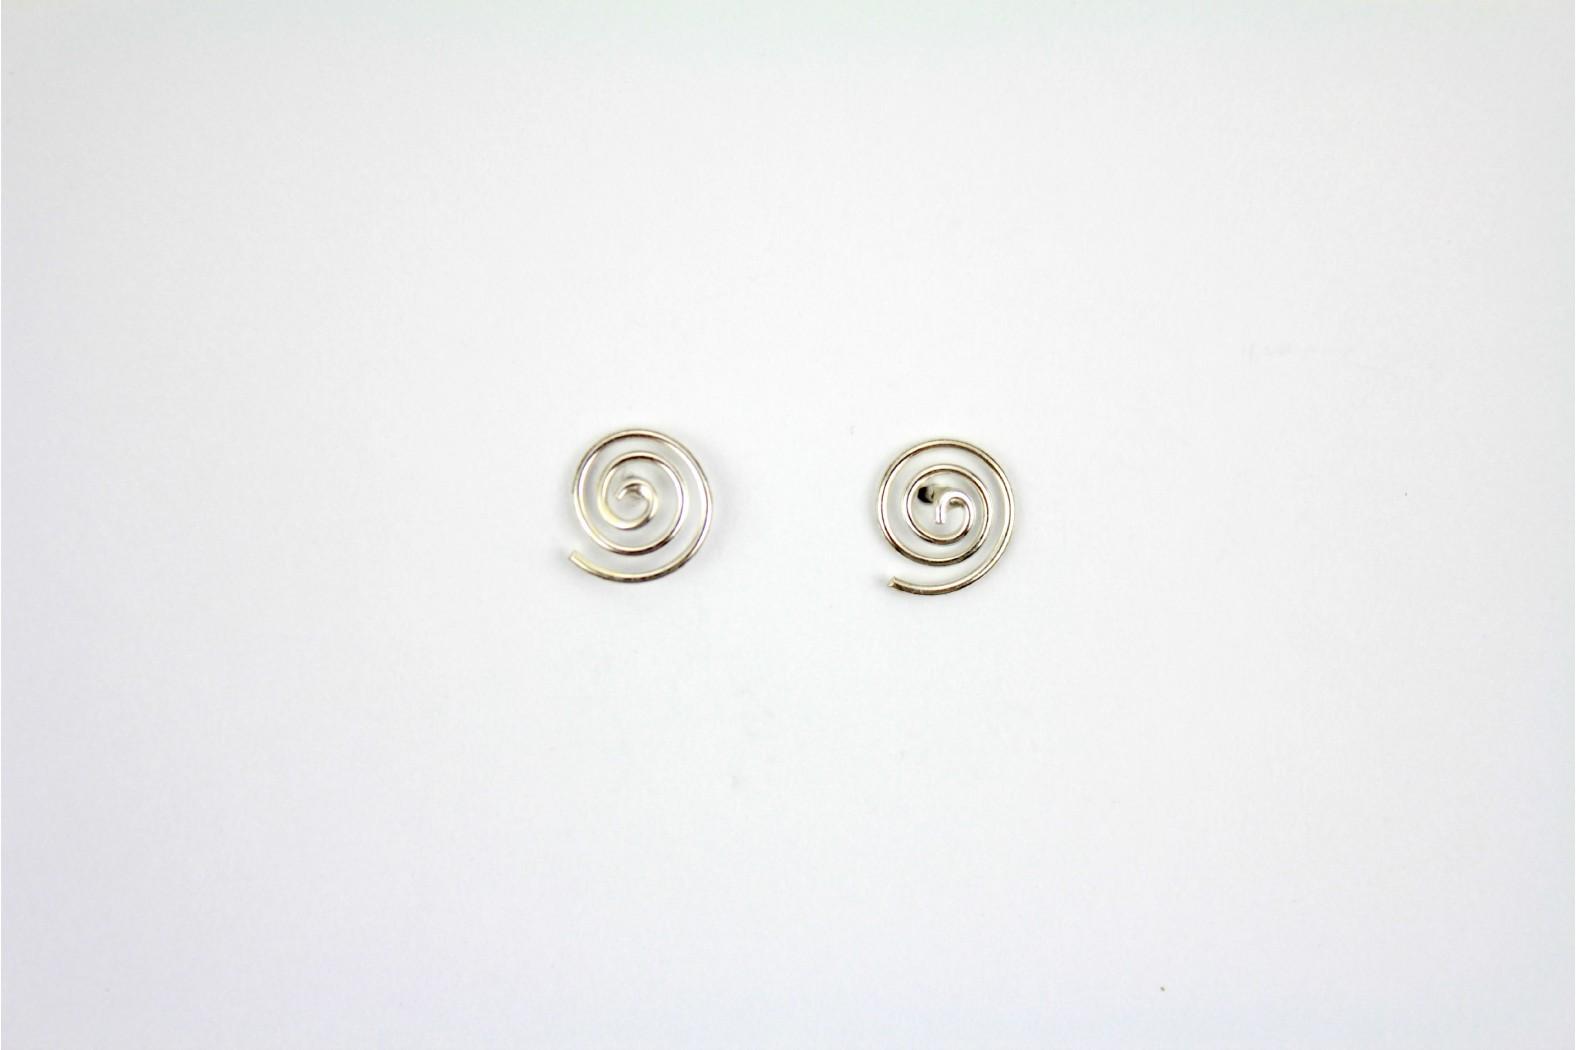 Simple Circular Swirl Designe Silver stud earrings